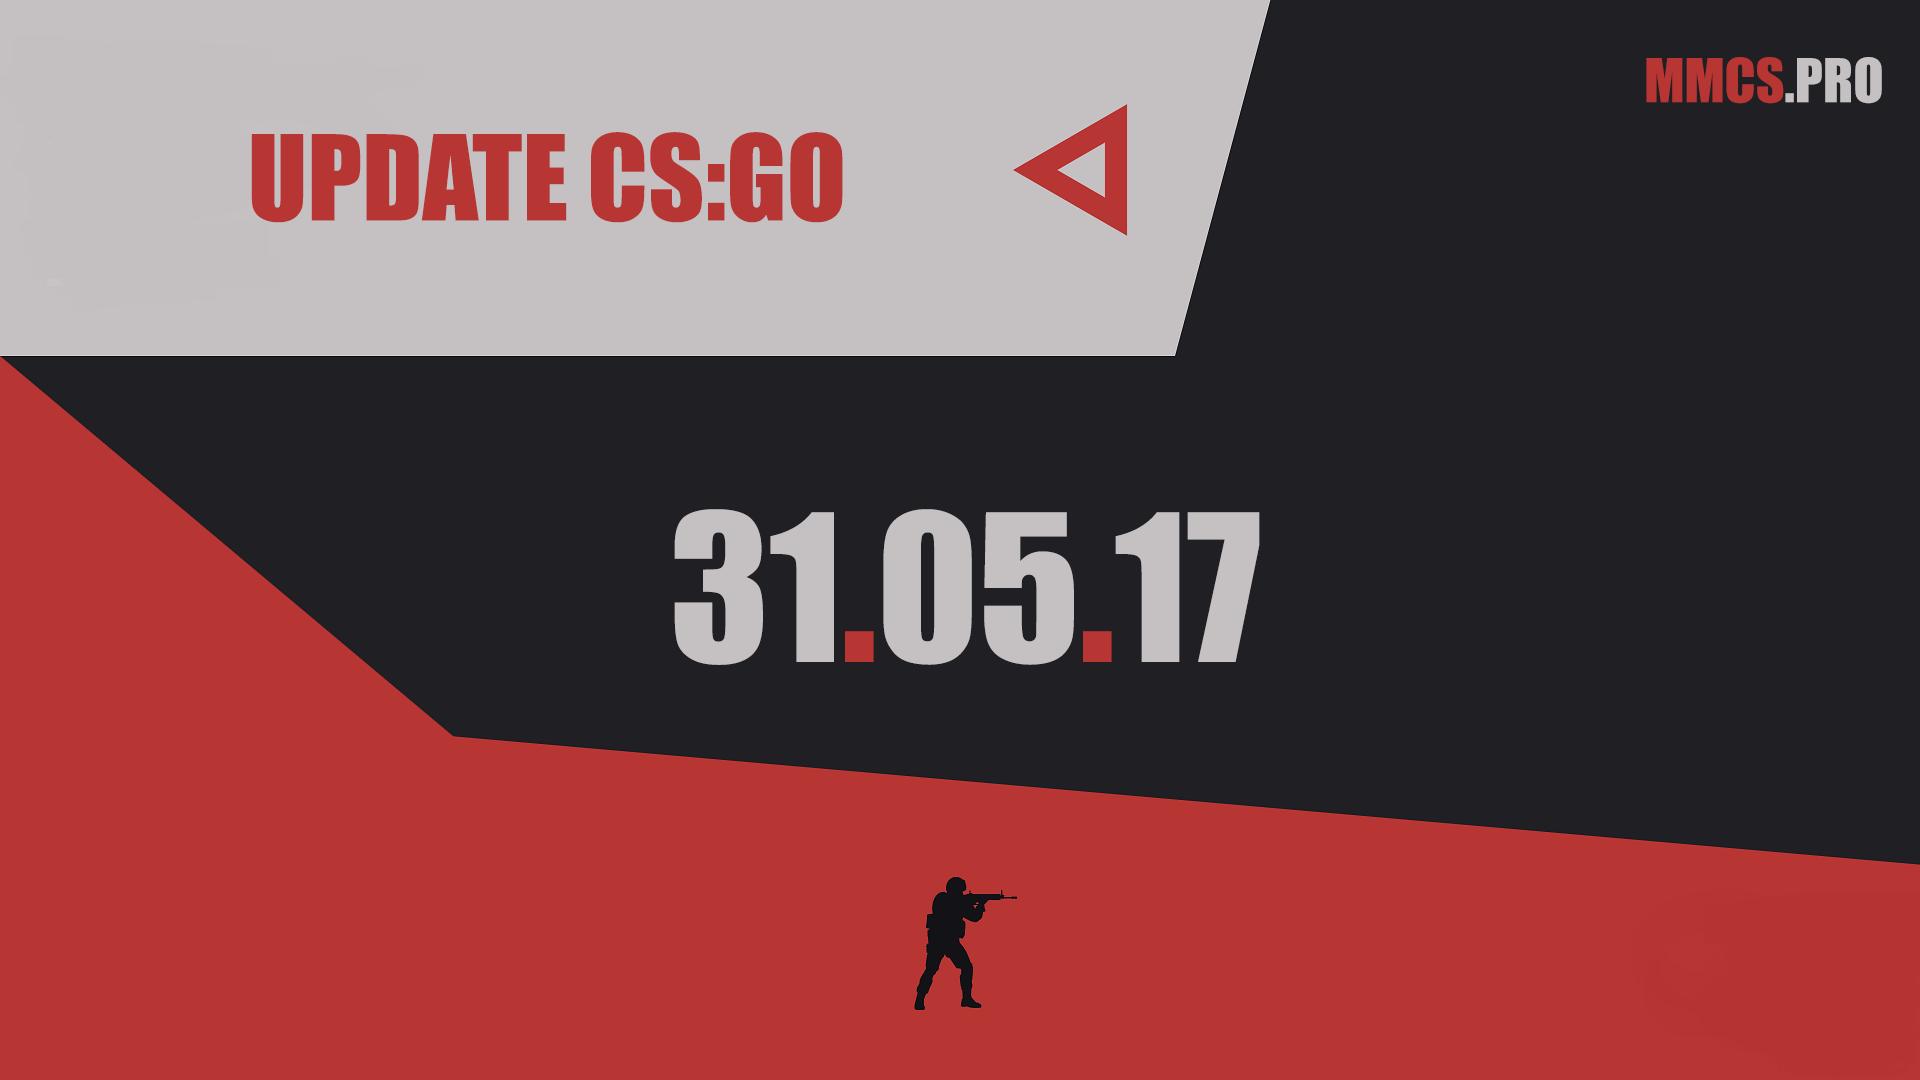 https://mmcs.pro/update-csgo-31-05-2017-valve/